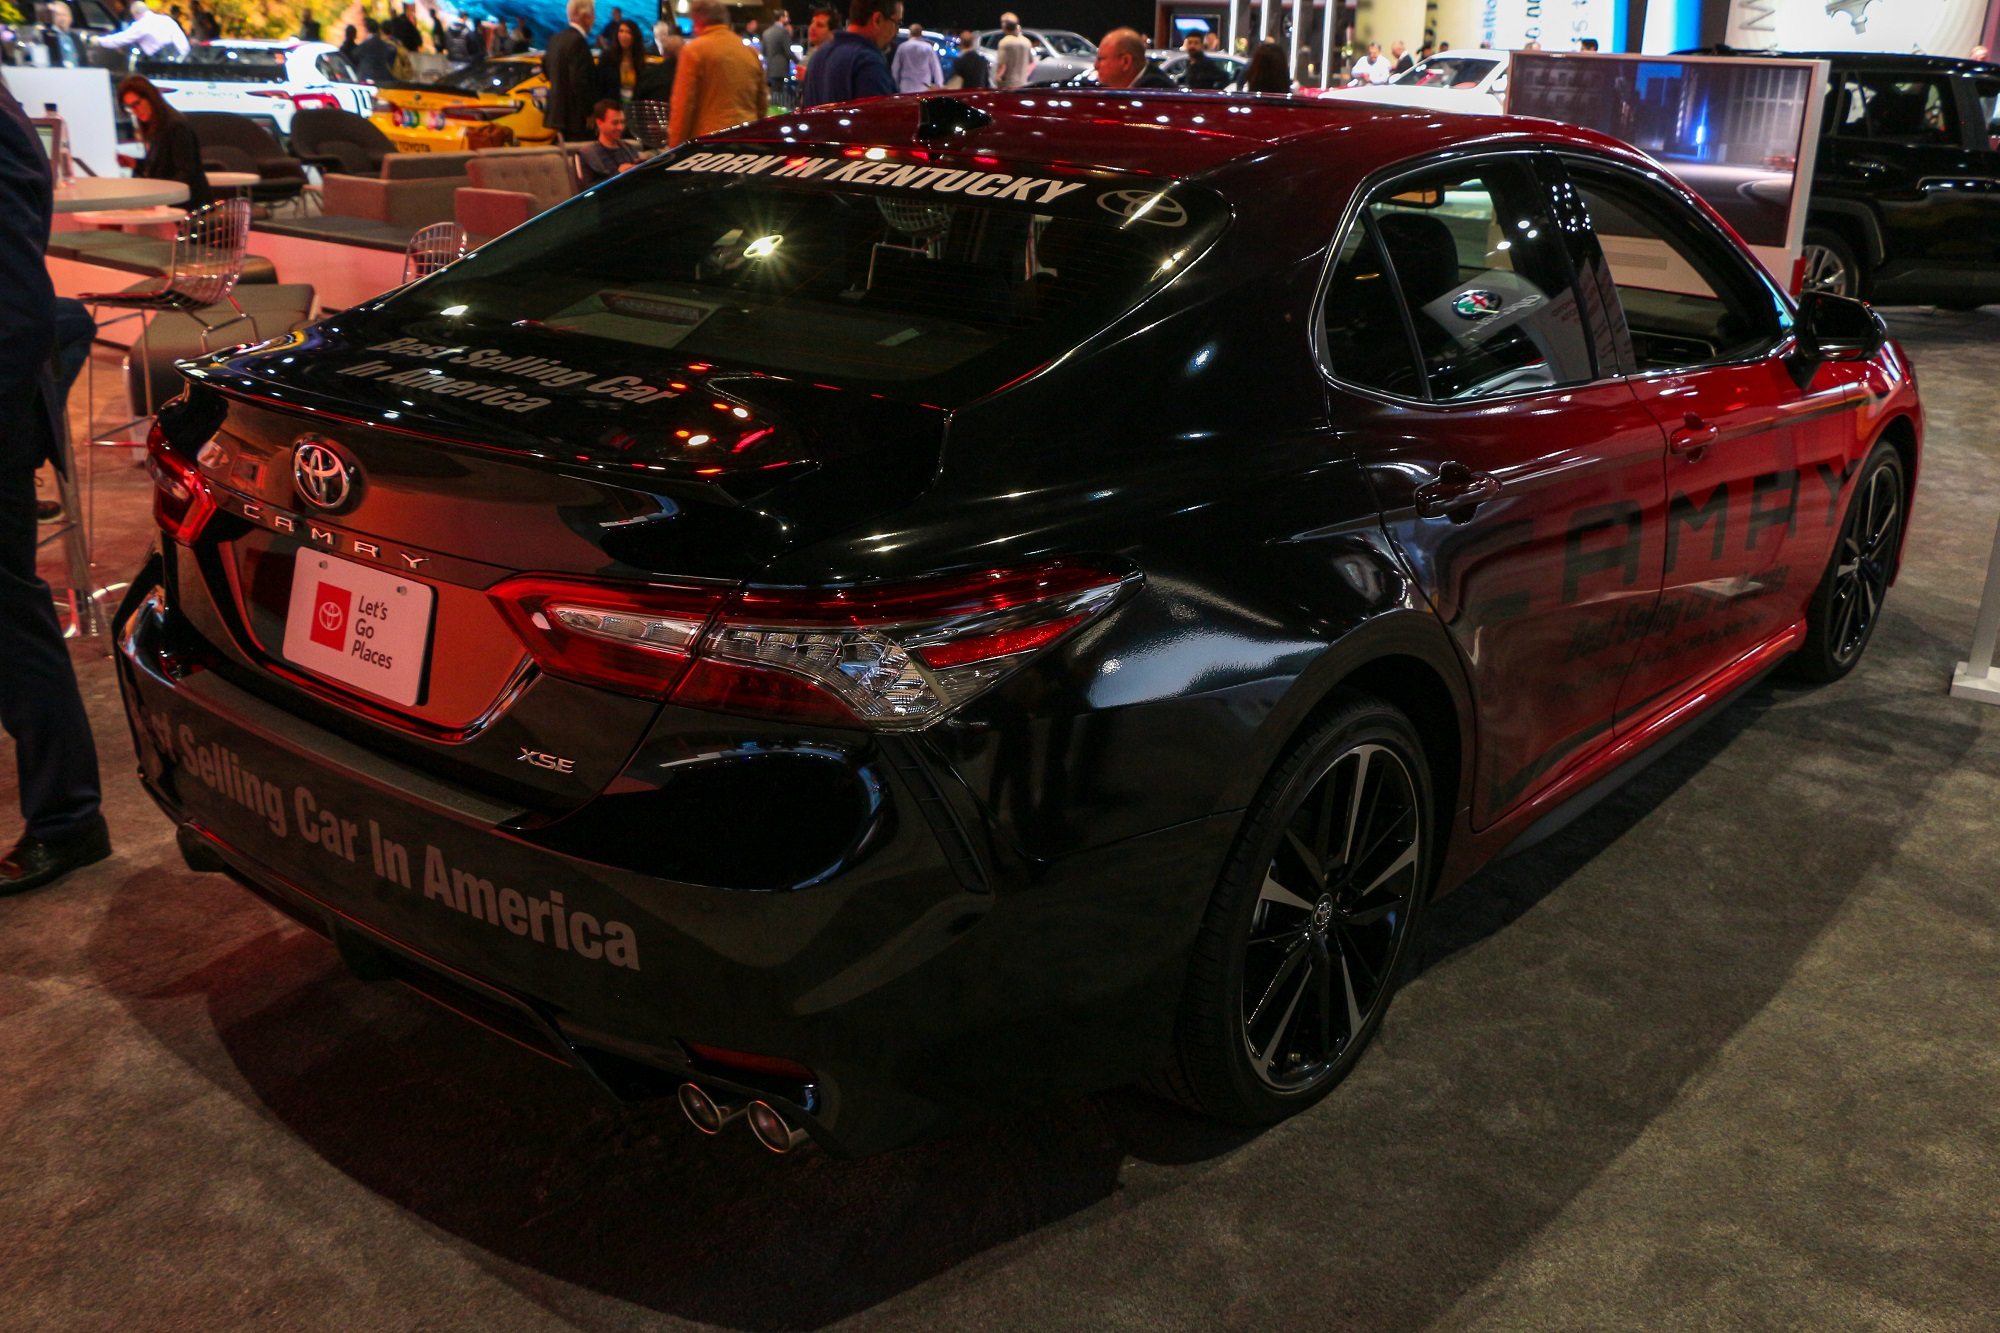 2019 Toyota Camry Los Angeles Auto Show